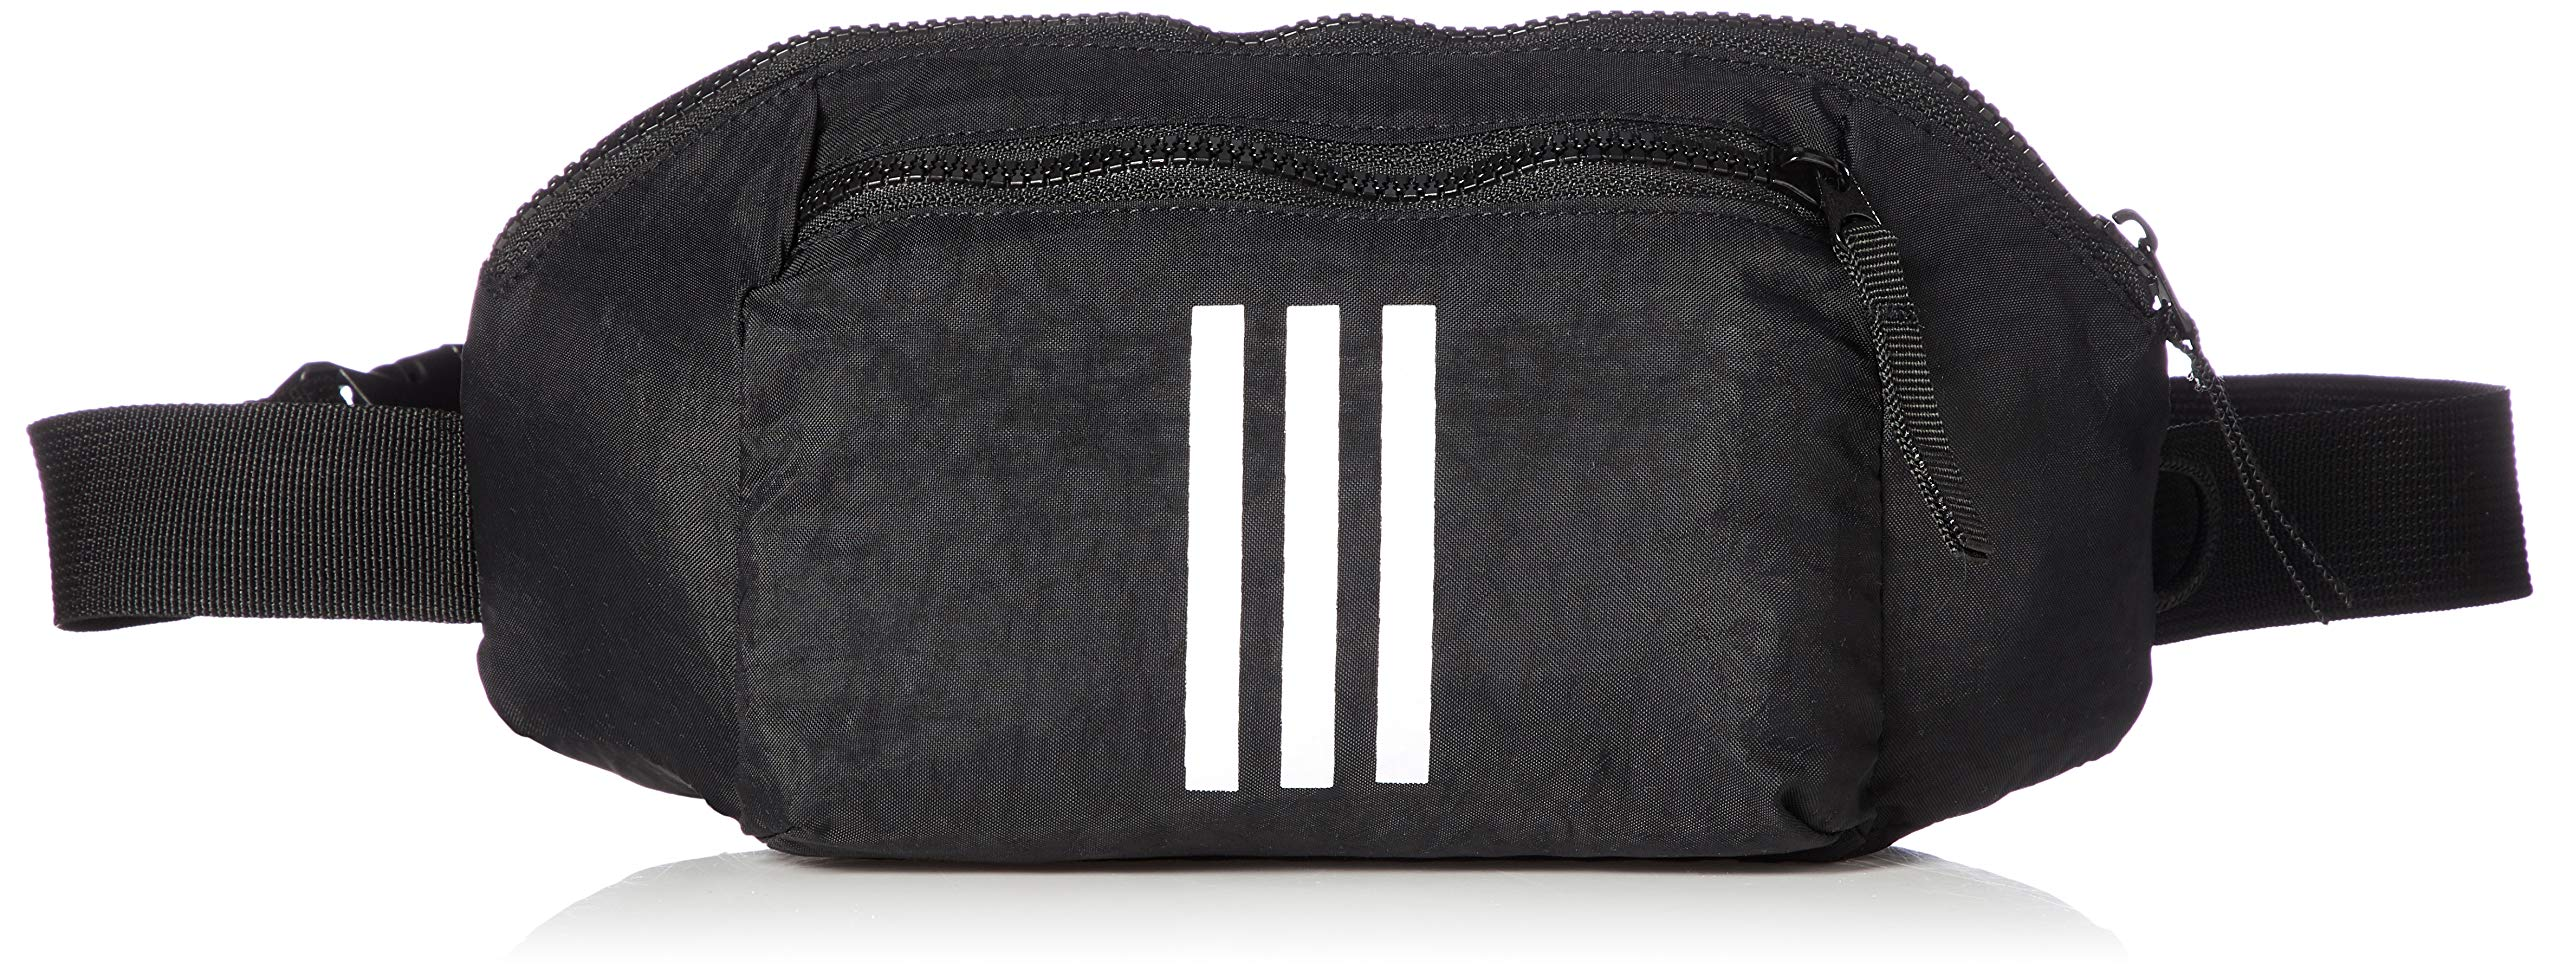 adidas Parkhood Waist Bag